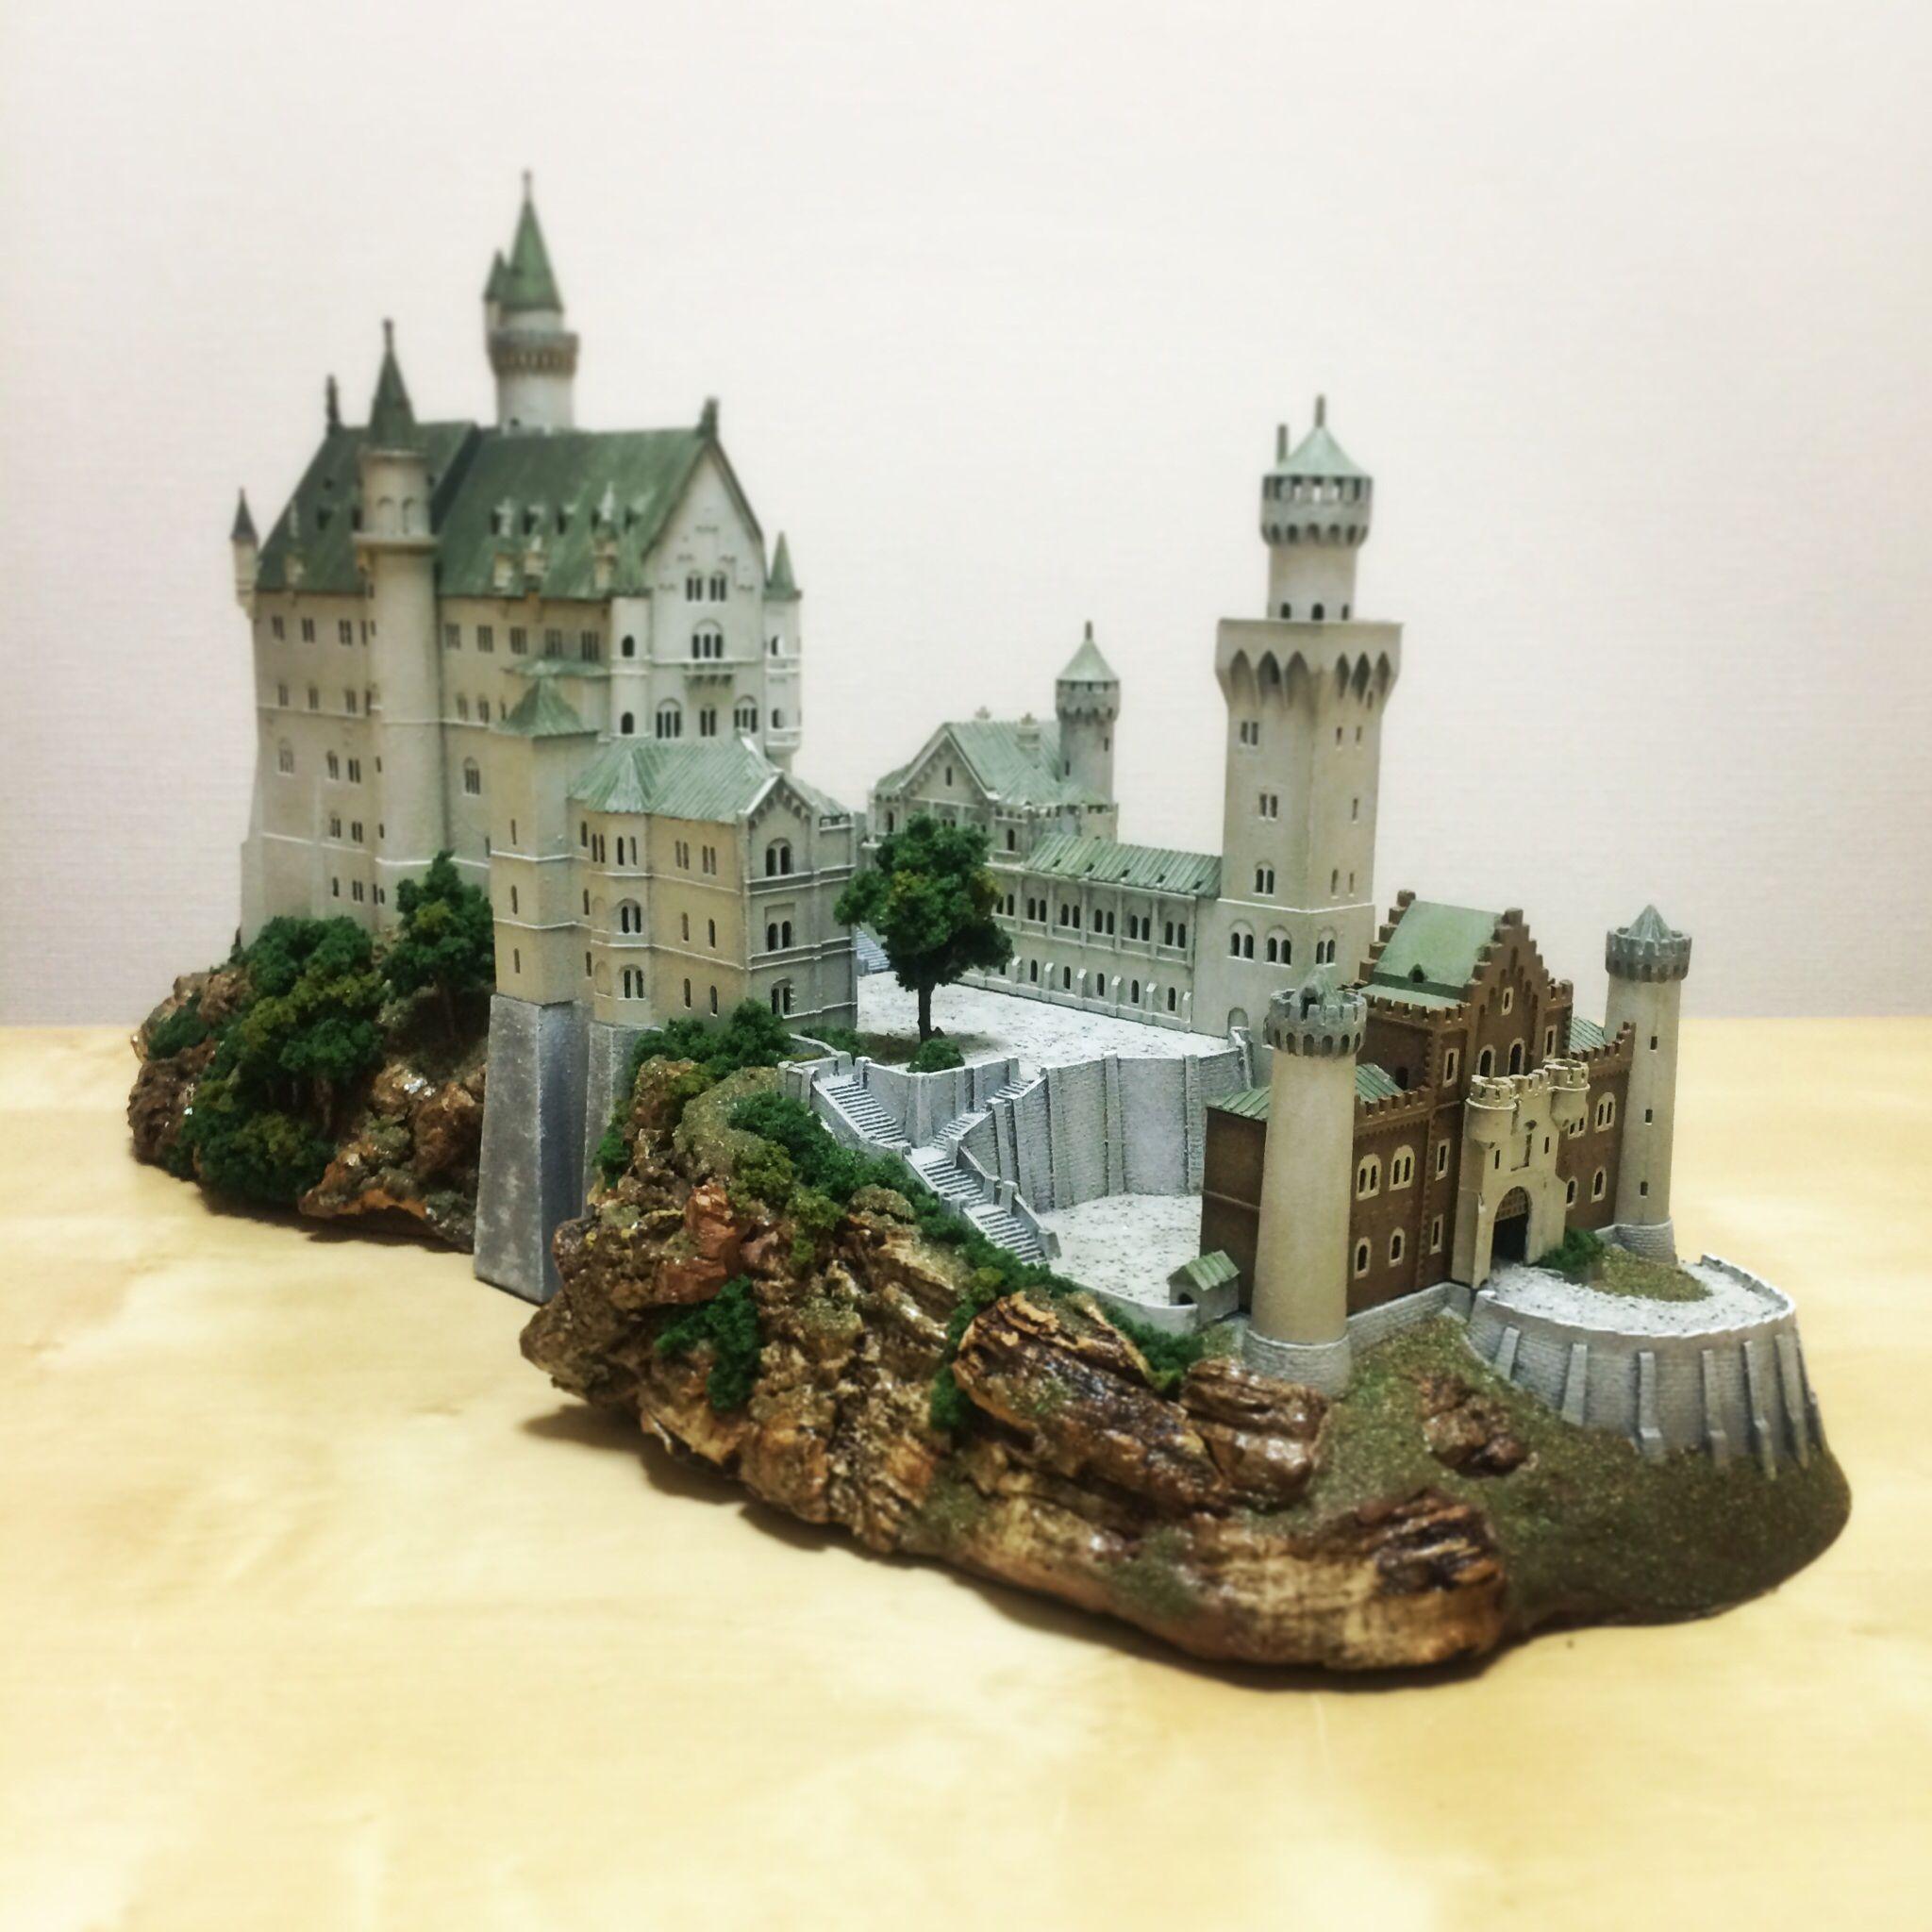 Schloss Neuschwanstein Plastic Model Castle Building Neuschwanstein Castle Beautiful Castles Real Castles